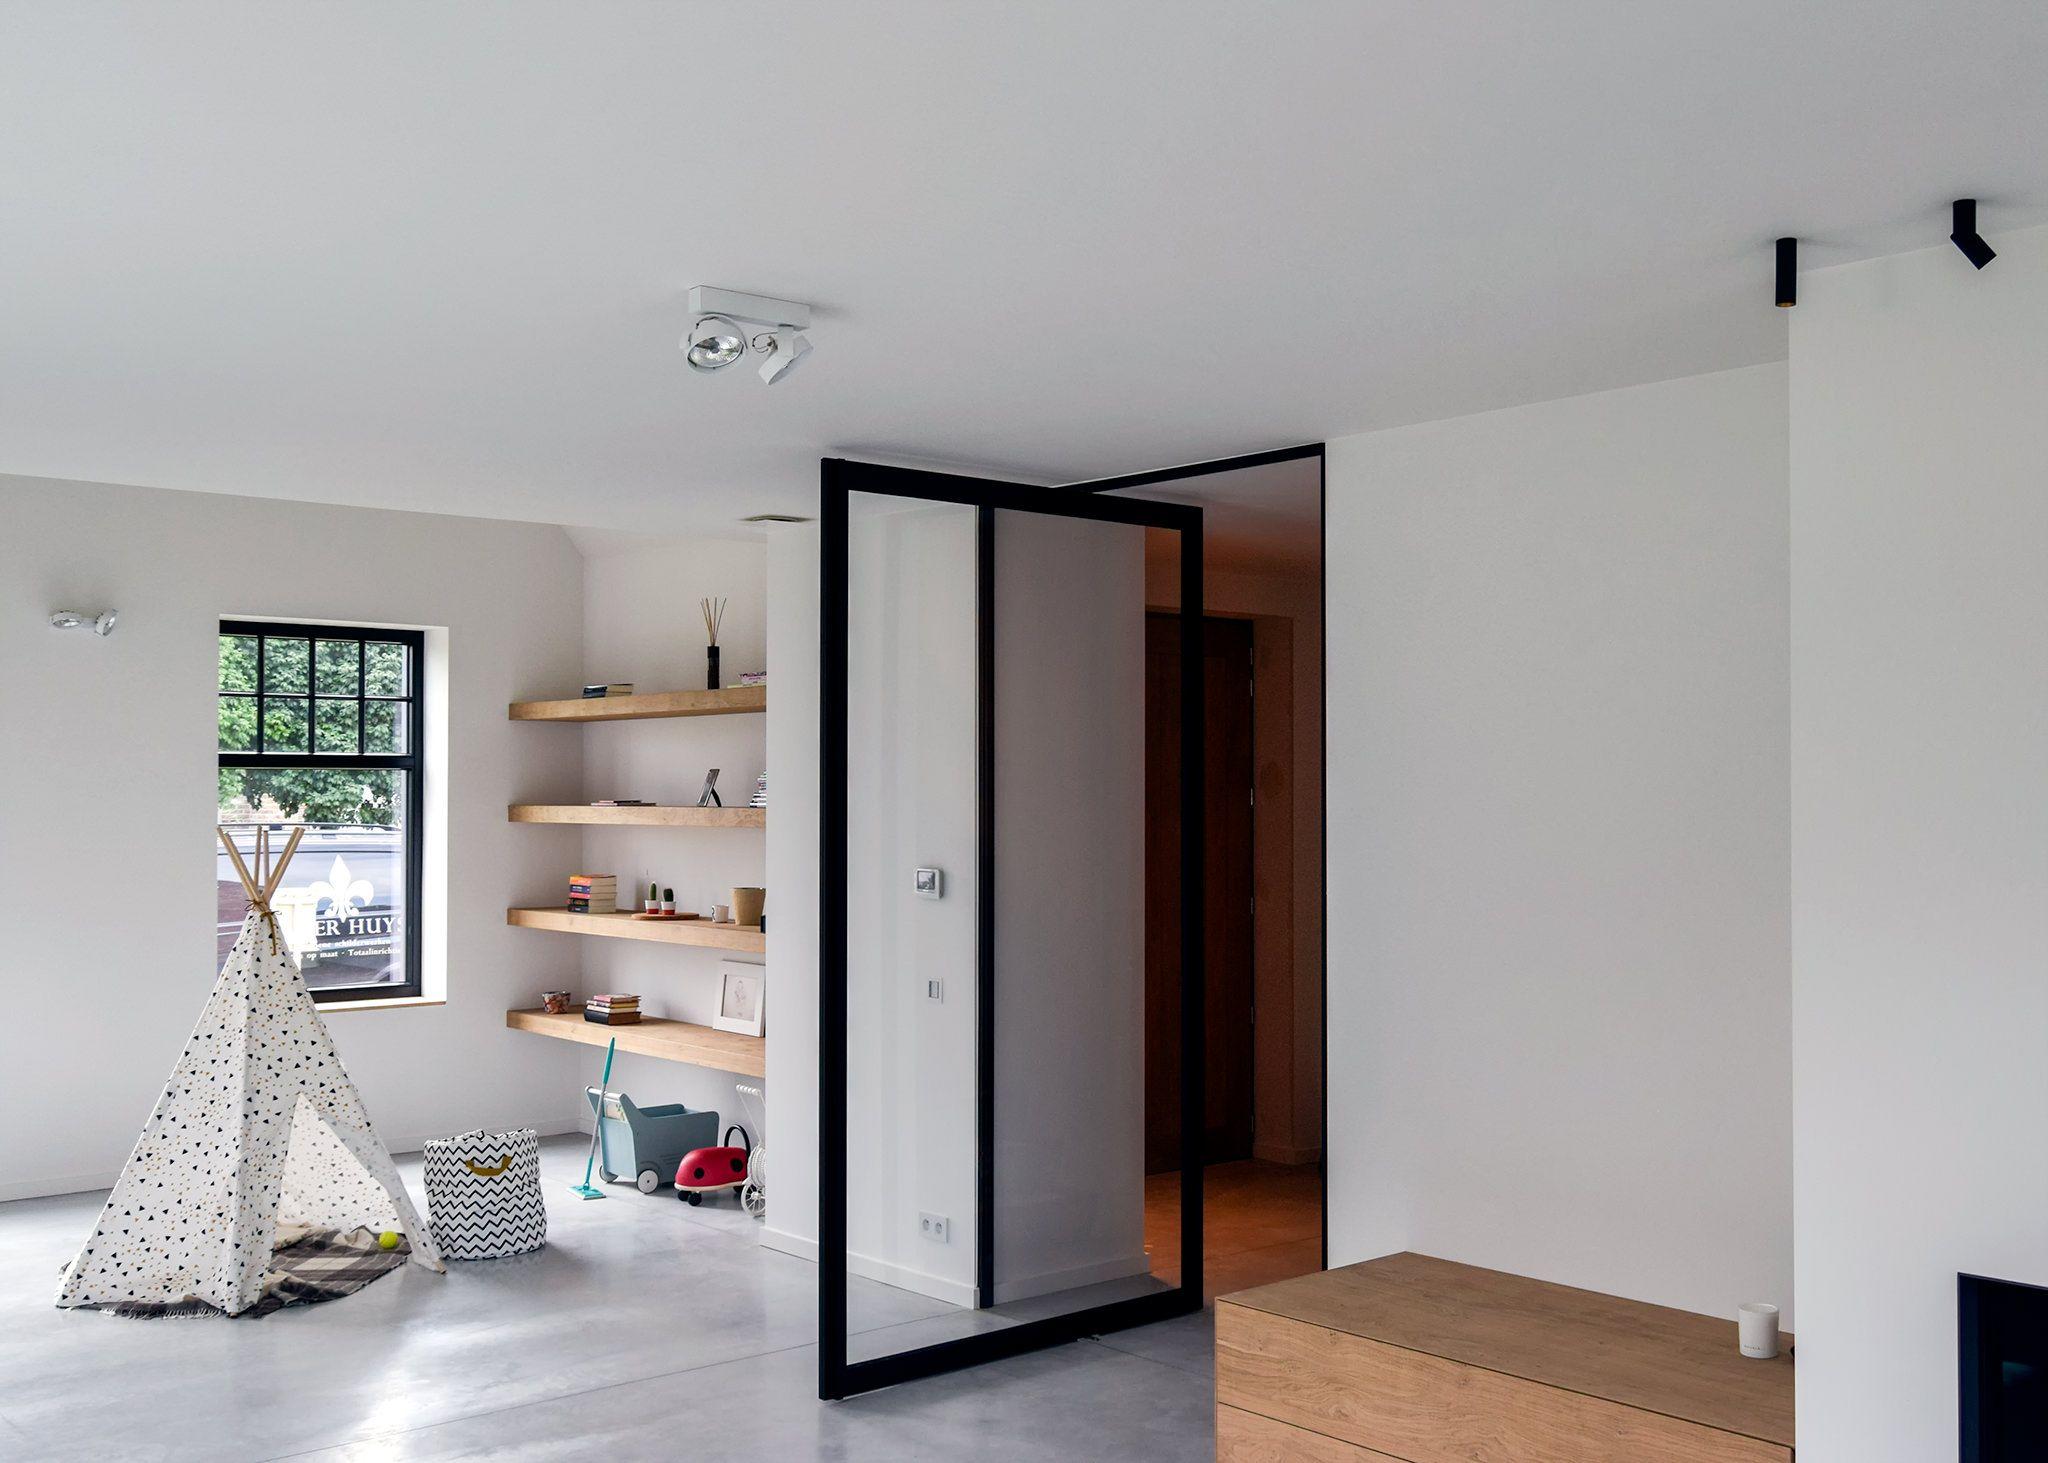 Glass door on pivot